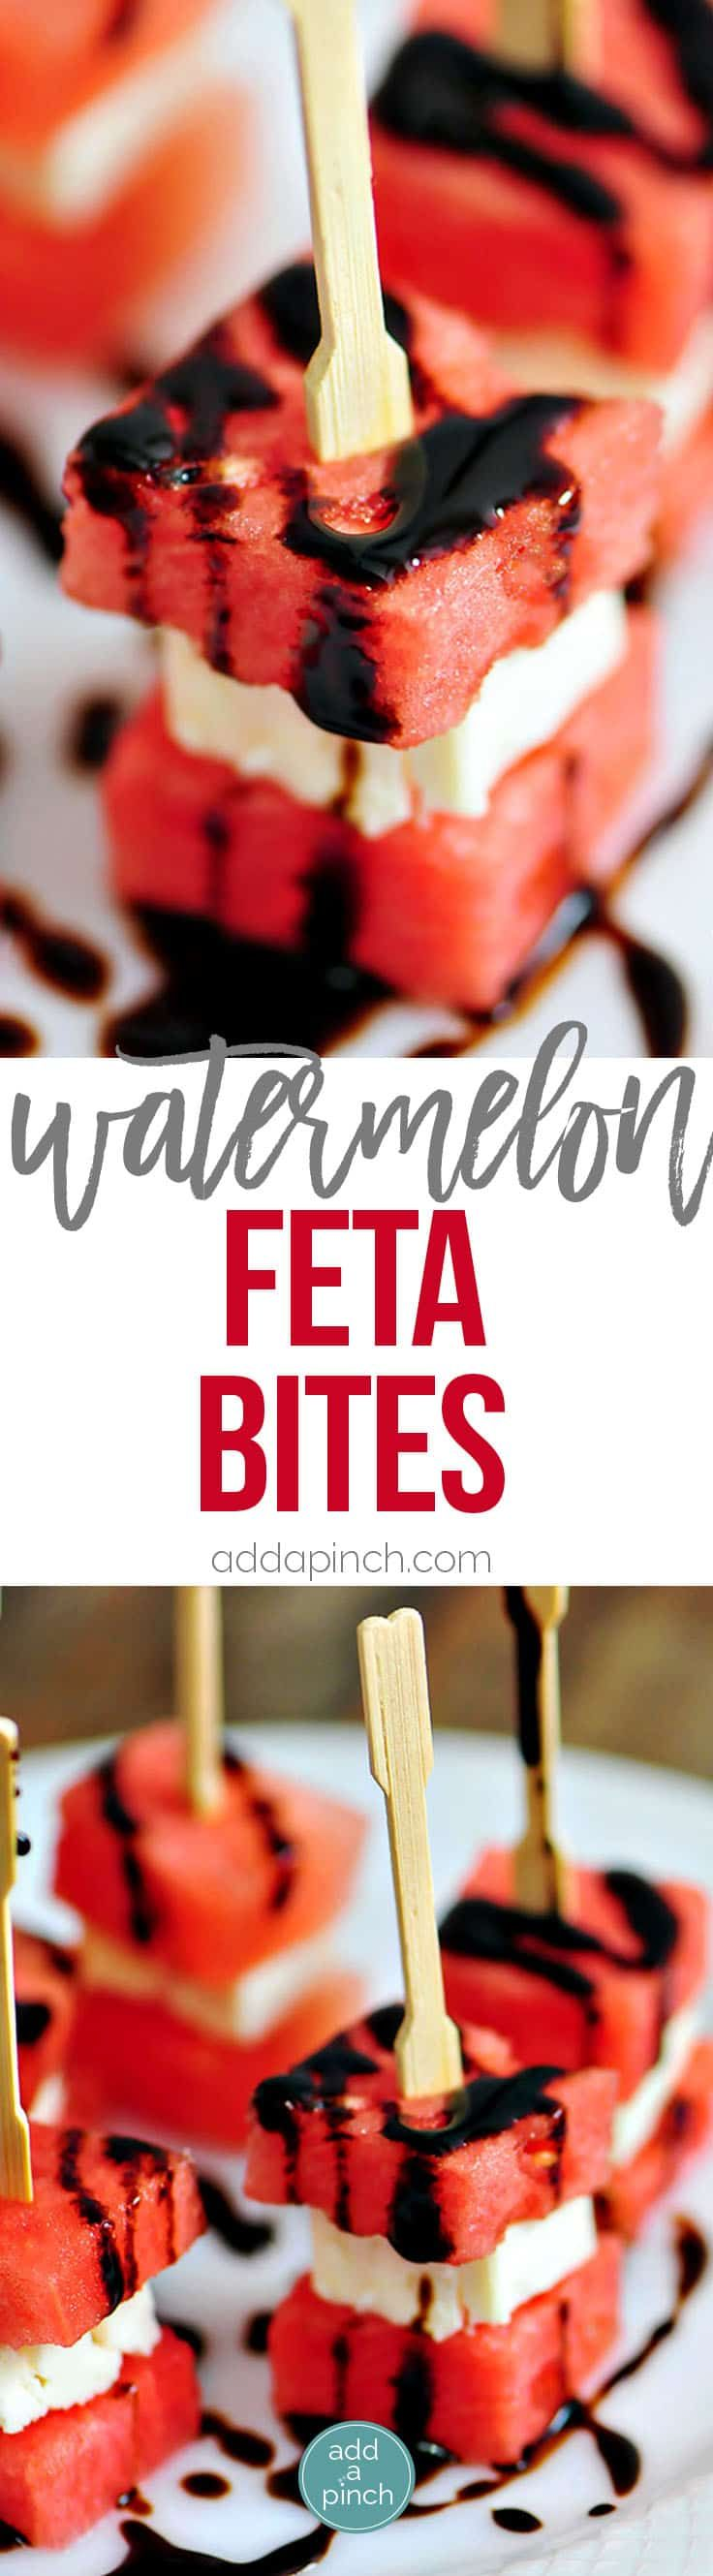 Watermelon Feta Bites Recipe - Watermelon Feta Appetizer Bites make a perfect appetizer that just screams summer! These easy, elegant Watermelon Feta Appetizer Bites come together quickly. // addapinch.com